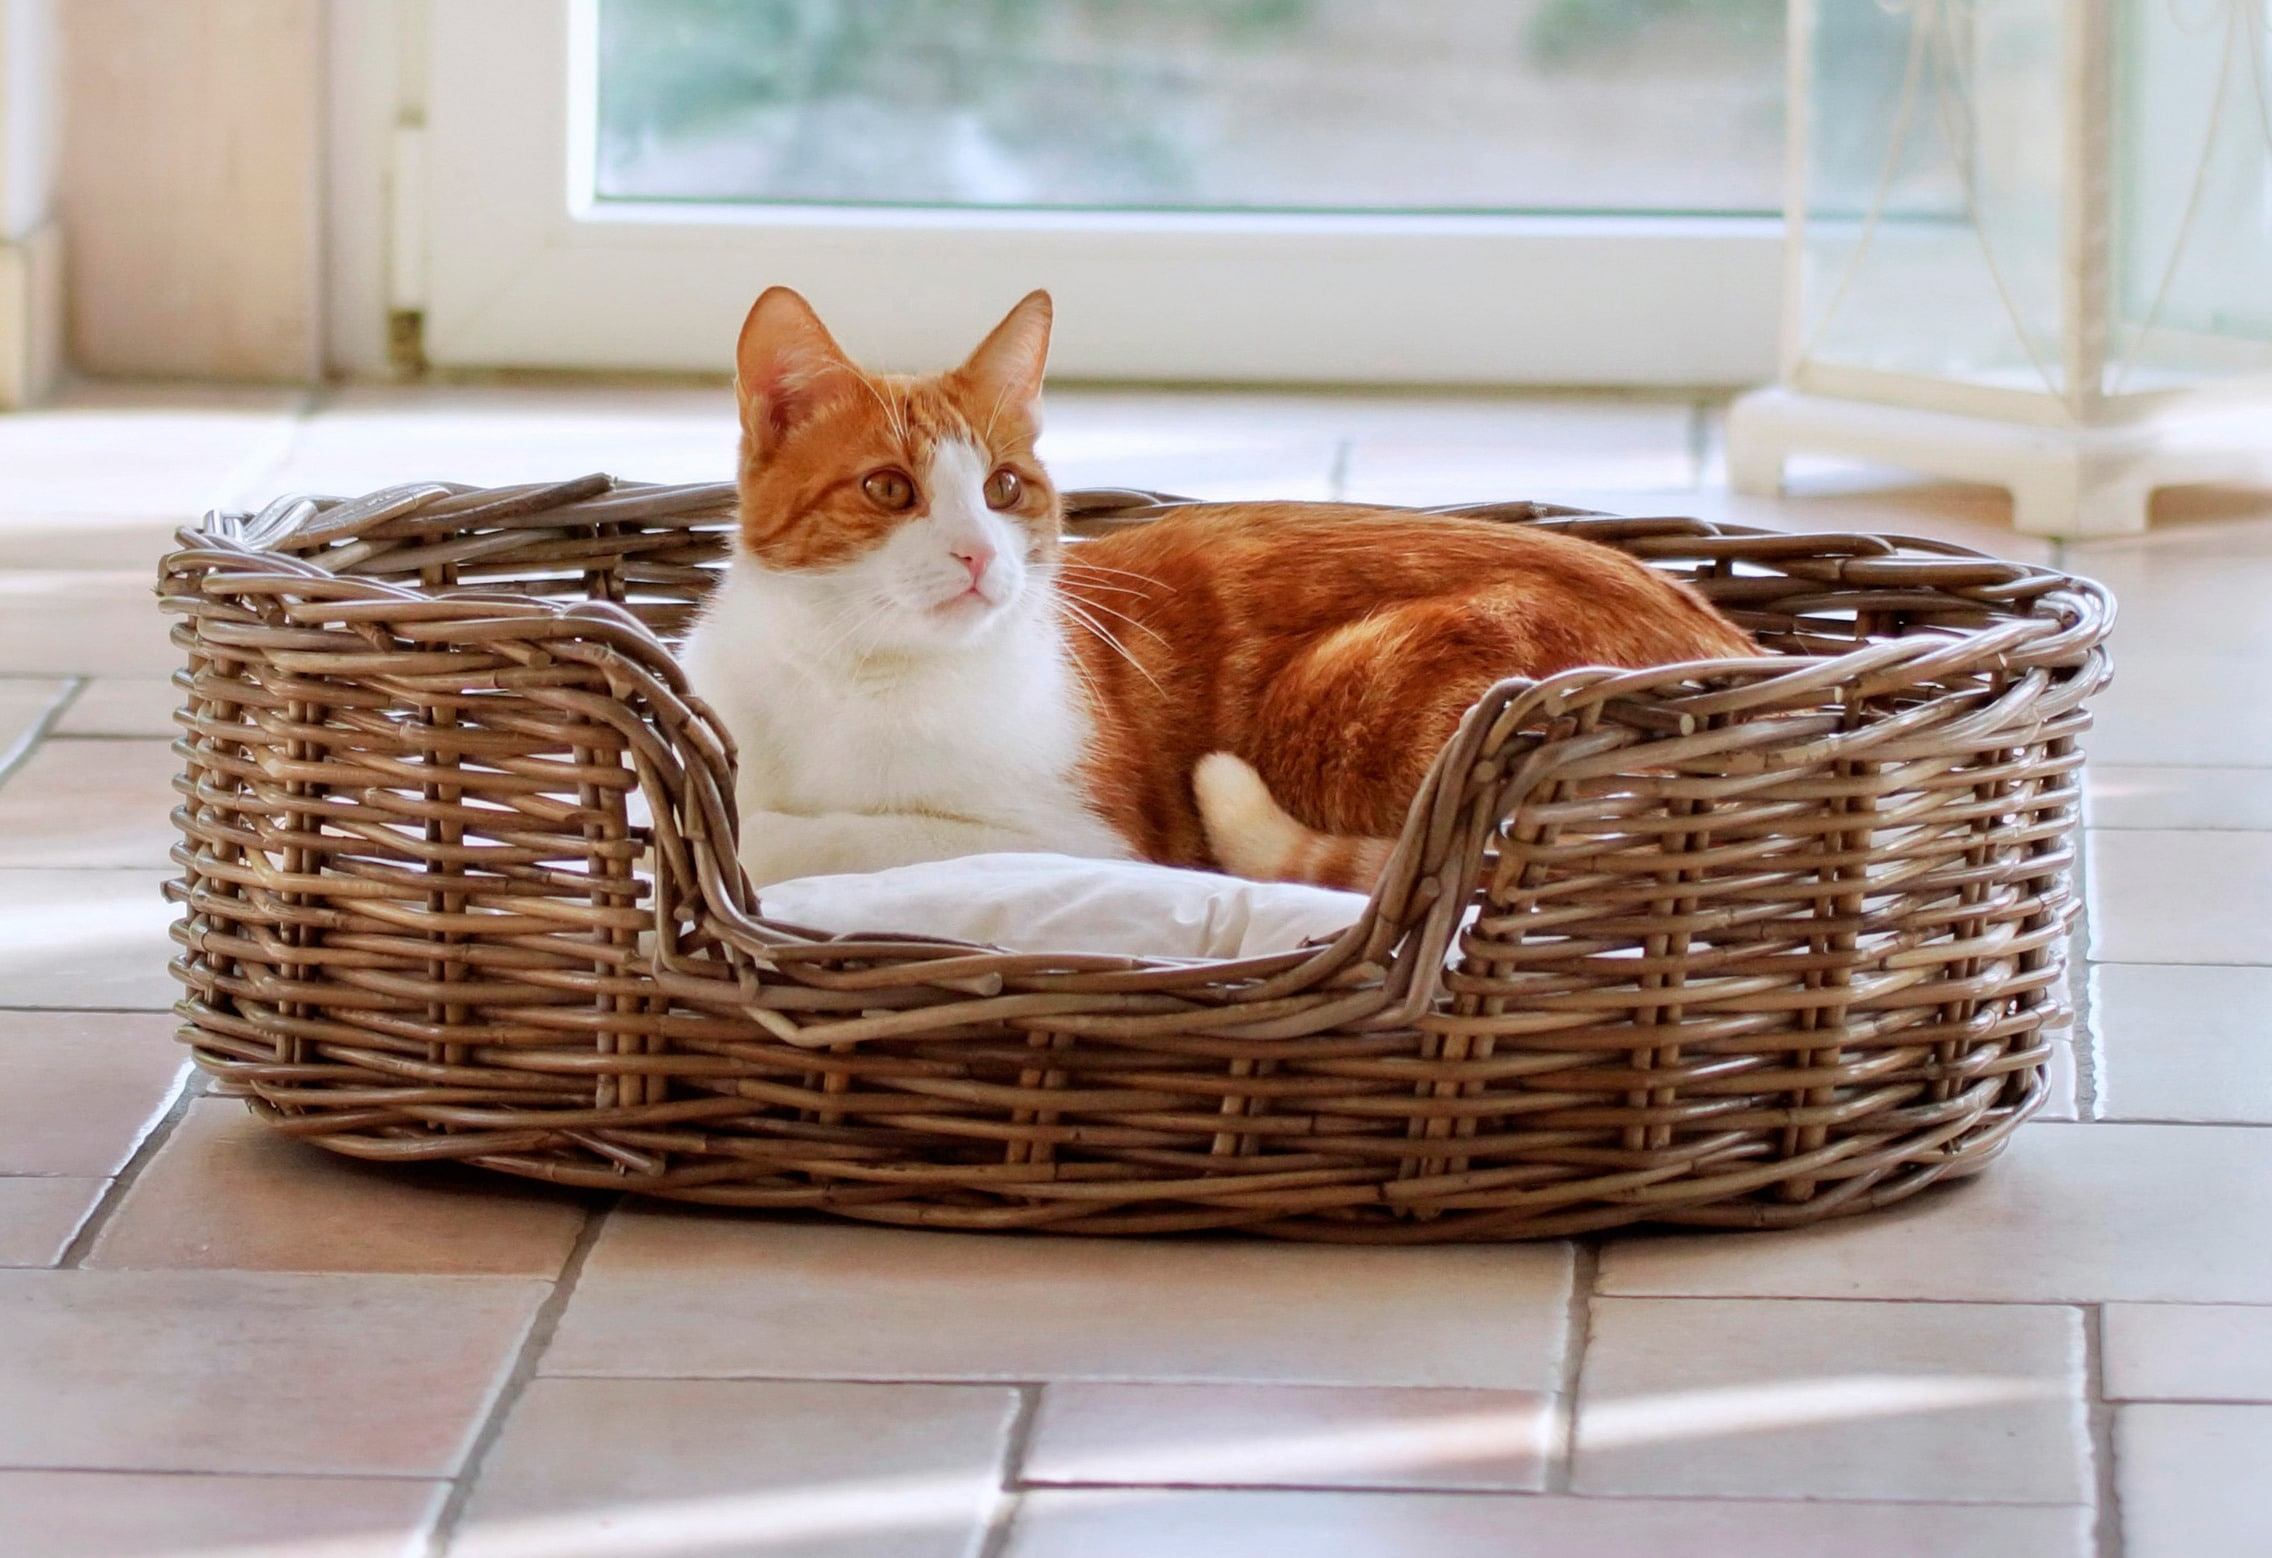 SILVIO DESIGN Hundekorb und Katzenkorb »Rattan« | Garten > Tiermöbel > Katzenkörbe | Braun | SILVIO DESIGN